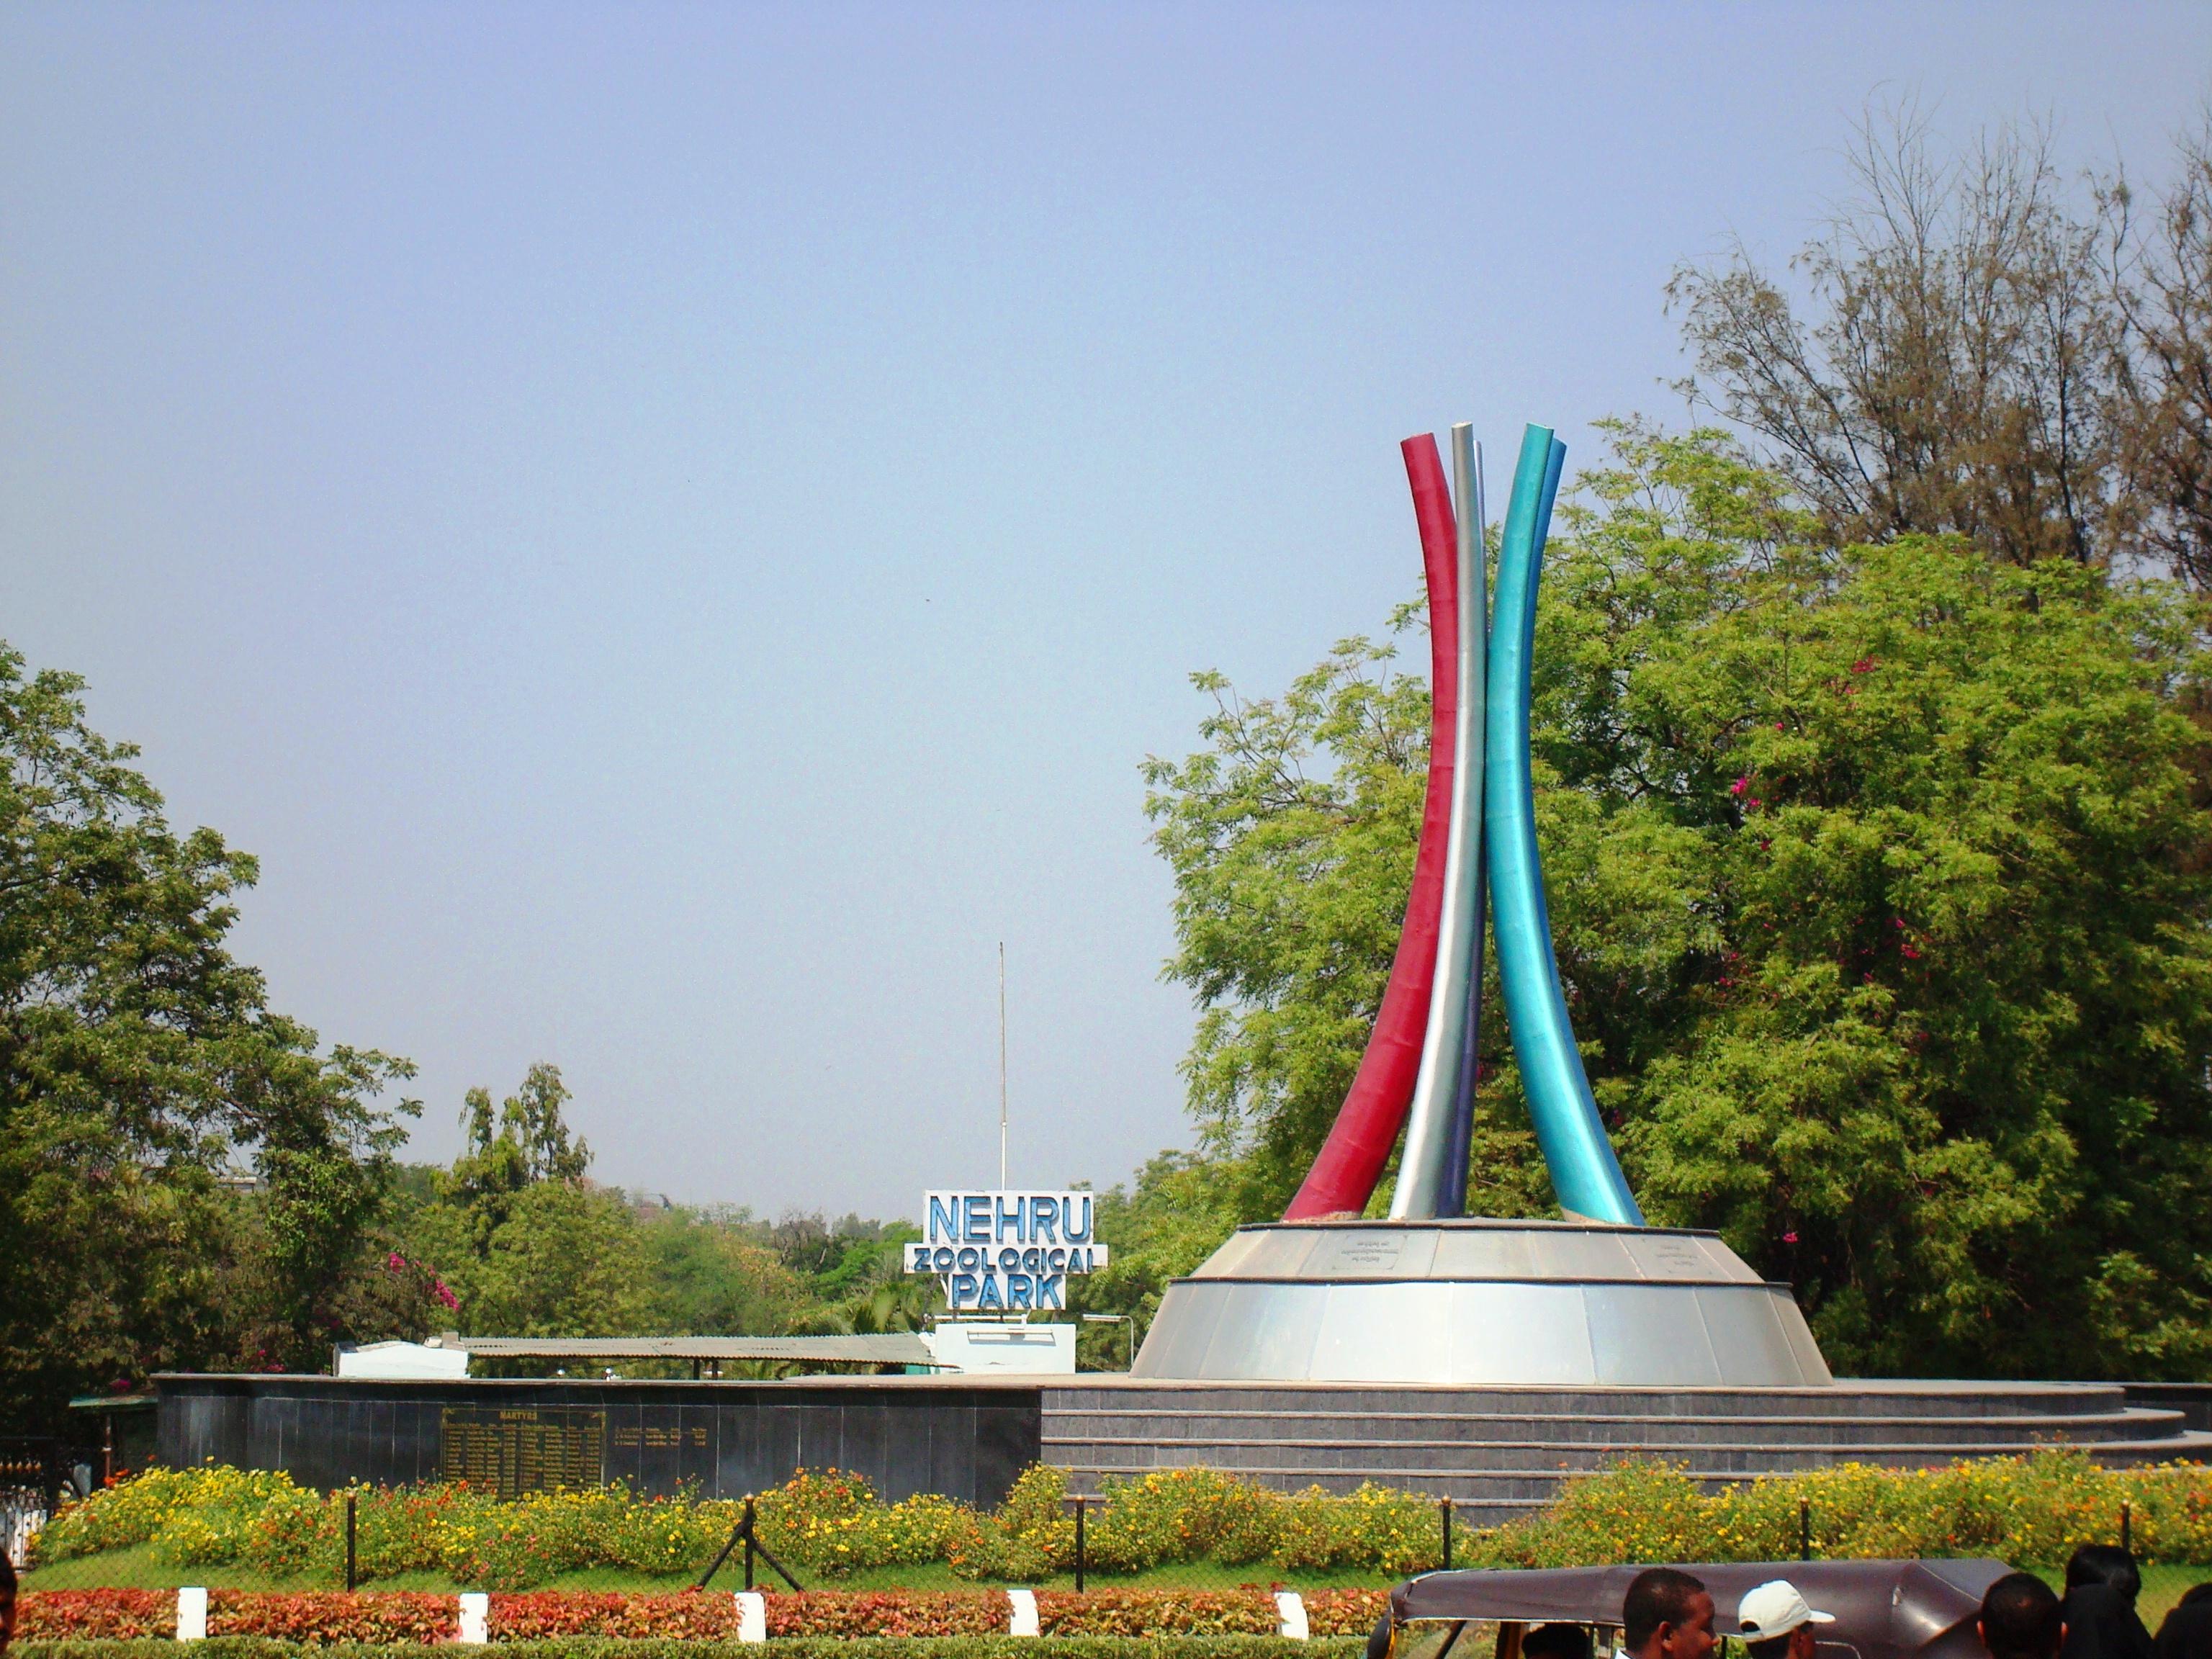 Nehru Zoological Park